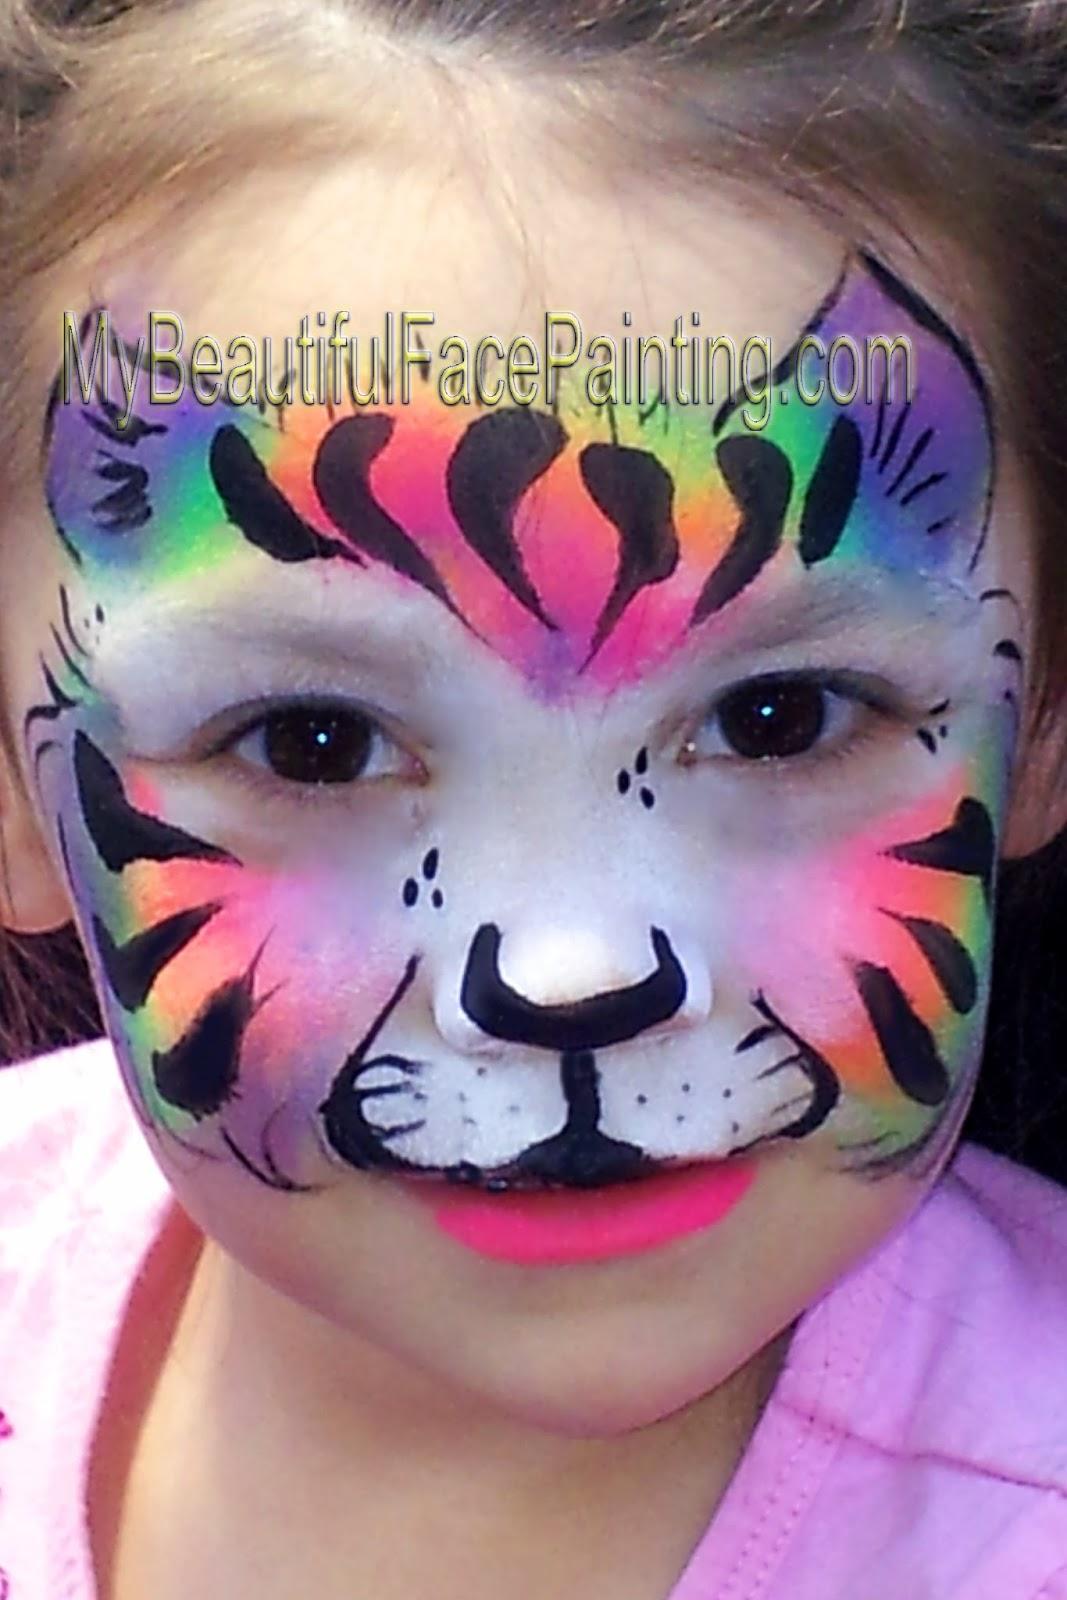 Face Paint The Story Of Makeup Amazon Co Uk Lisa: My Beautiful Face Painting Tulsa